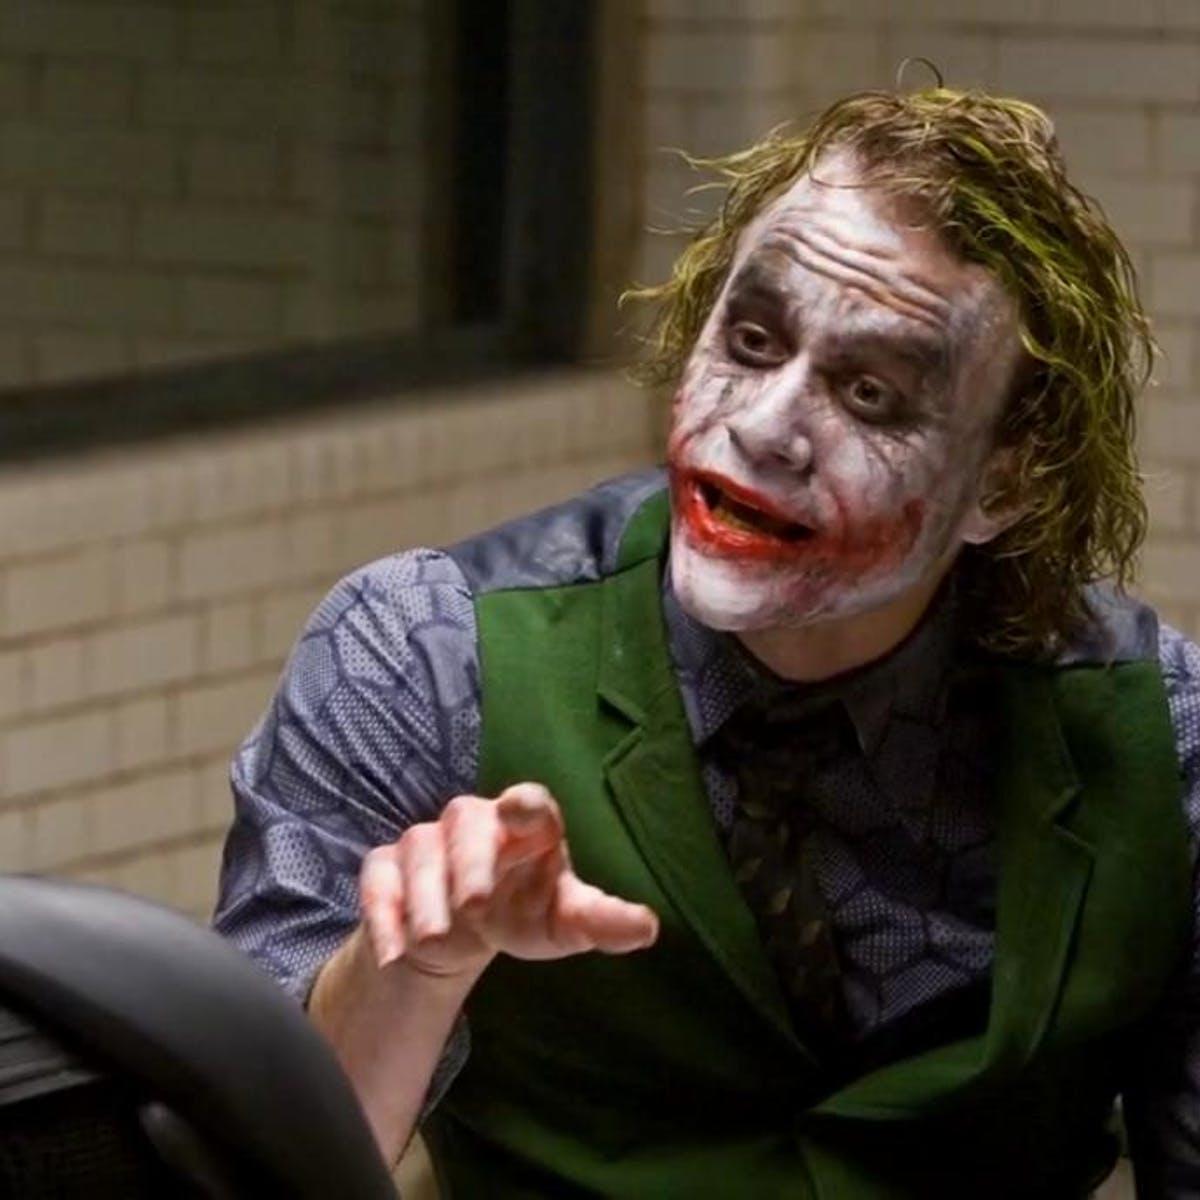 the dark knight 10 year anniversary joker The 20 Biggest Ways Joker Breaks the Superhero Mold